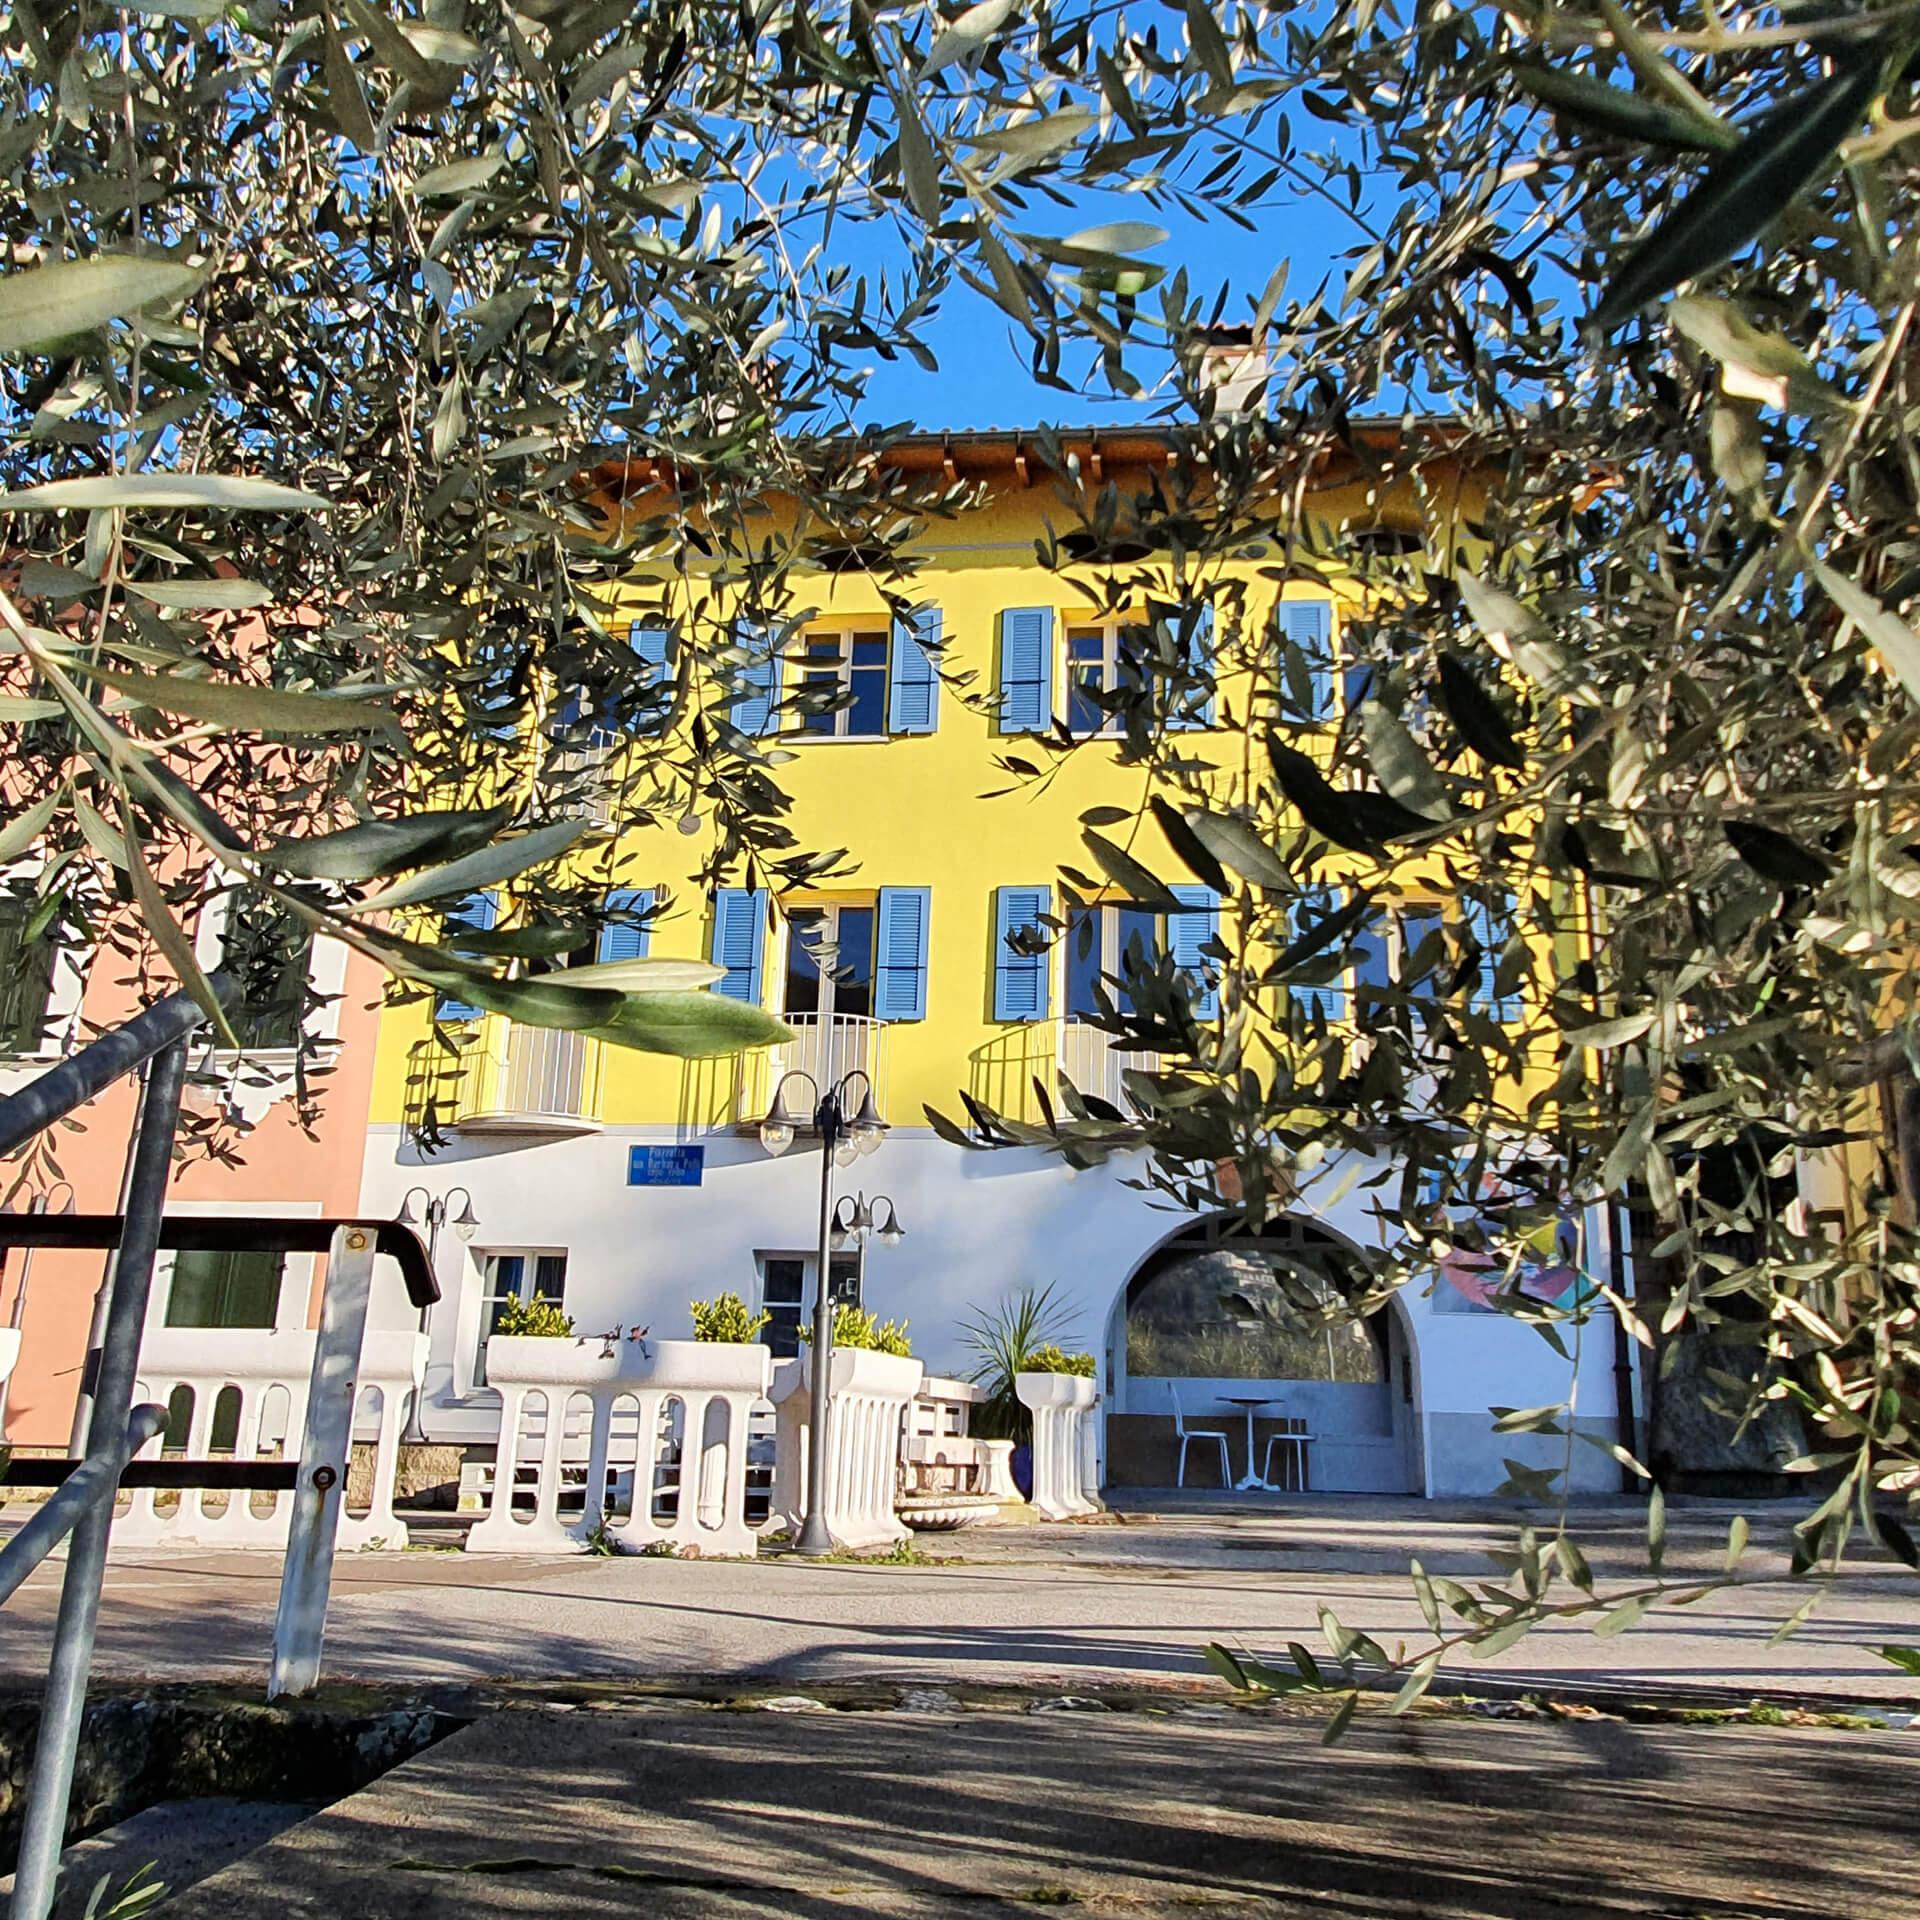 Dolceresio Lugano Lake B&B, Brusino Arsizio - Kontakt - Facciata 2 rit sq